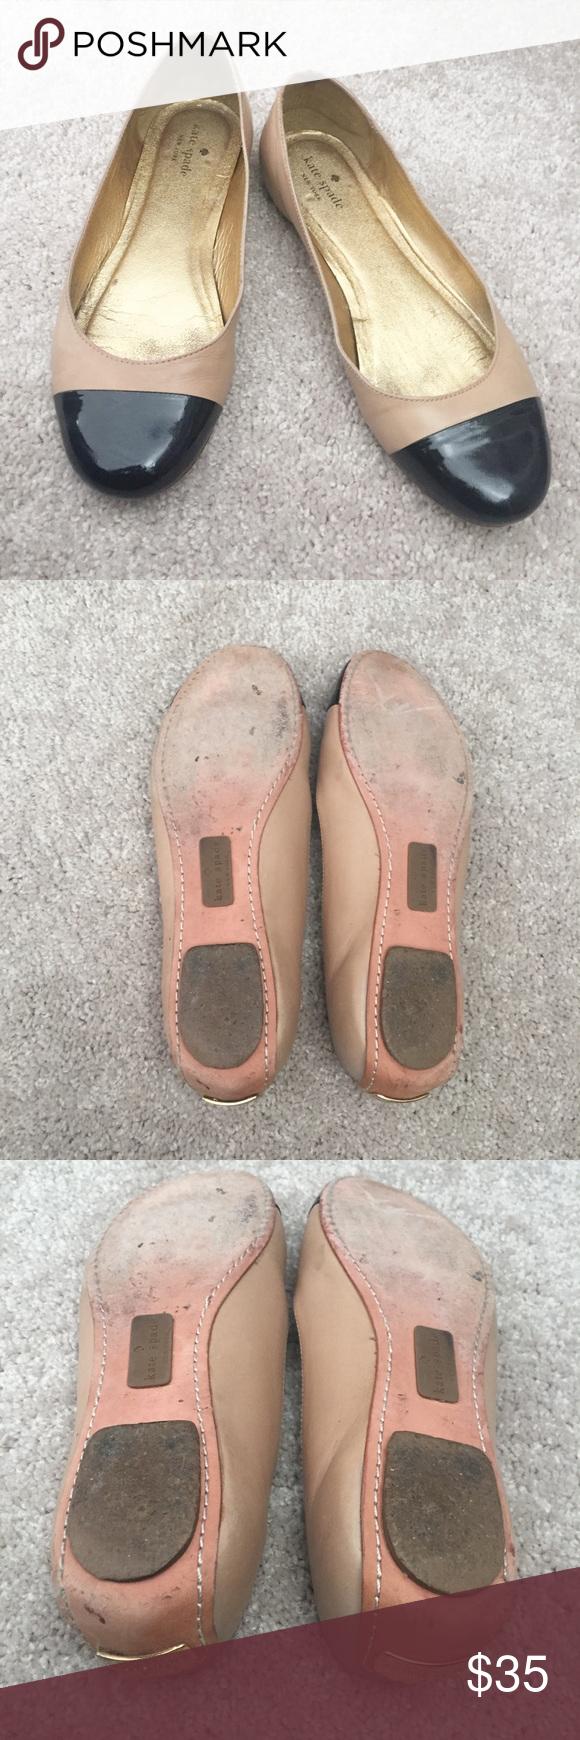 1d558e530a581 kate spade Black Cap Toe Leather Flats Size 8.5 Great condition black  patent cap toe flats